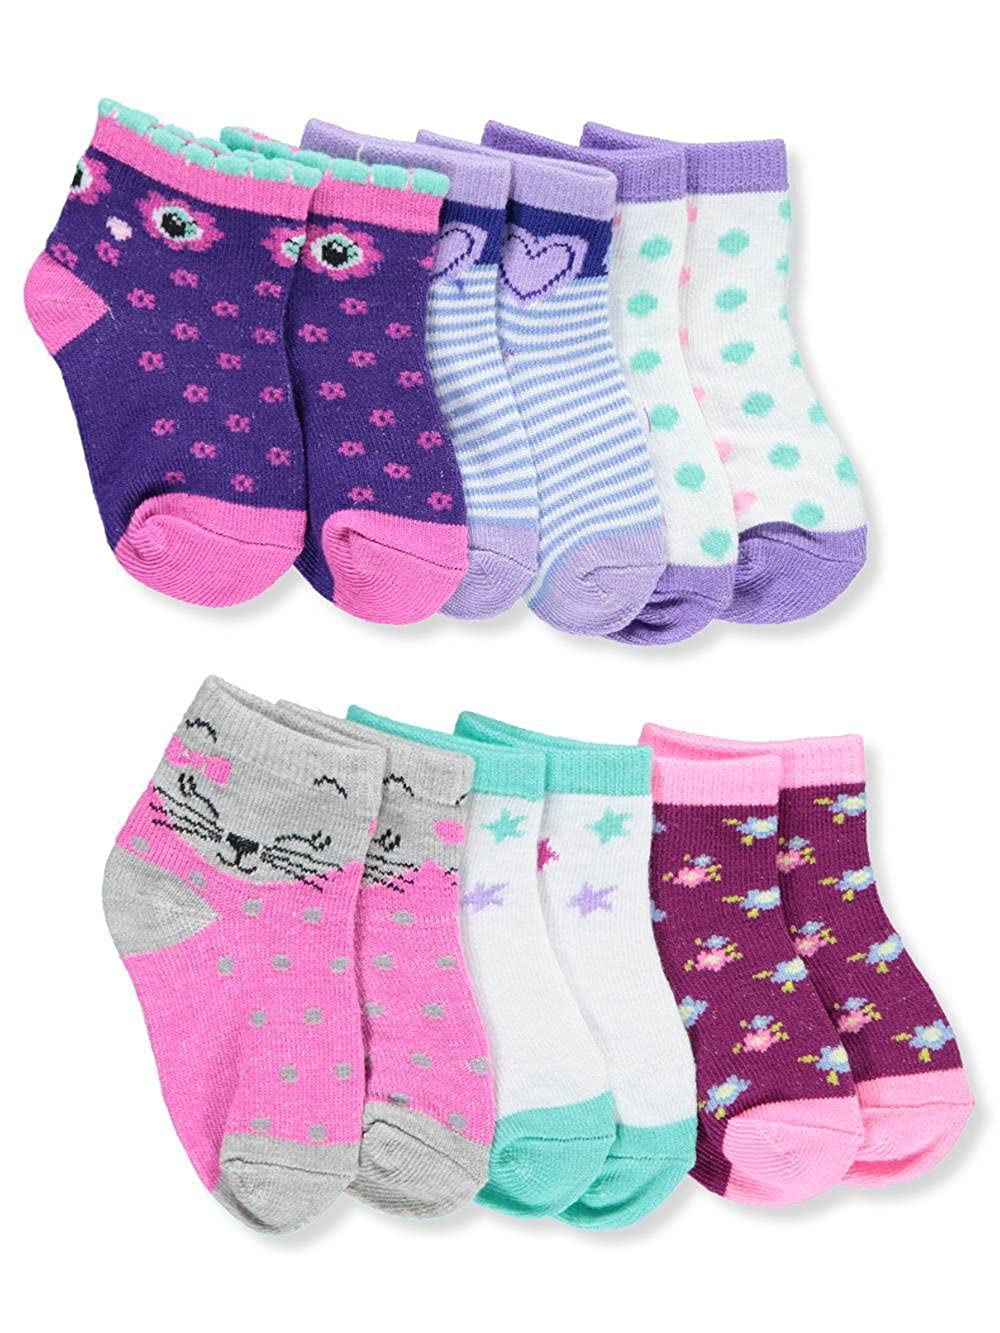 Zac & Zoey Baby Girls\' 6-Pack Ankle Socks